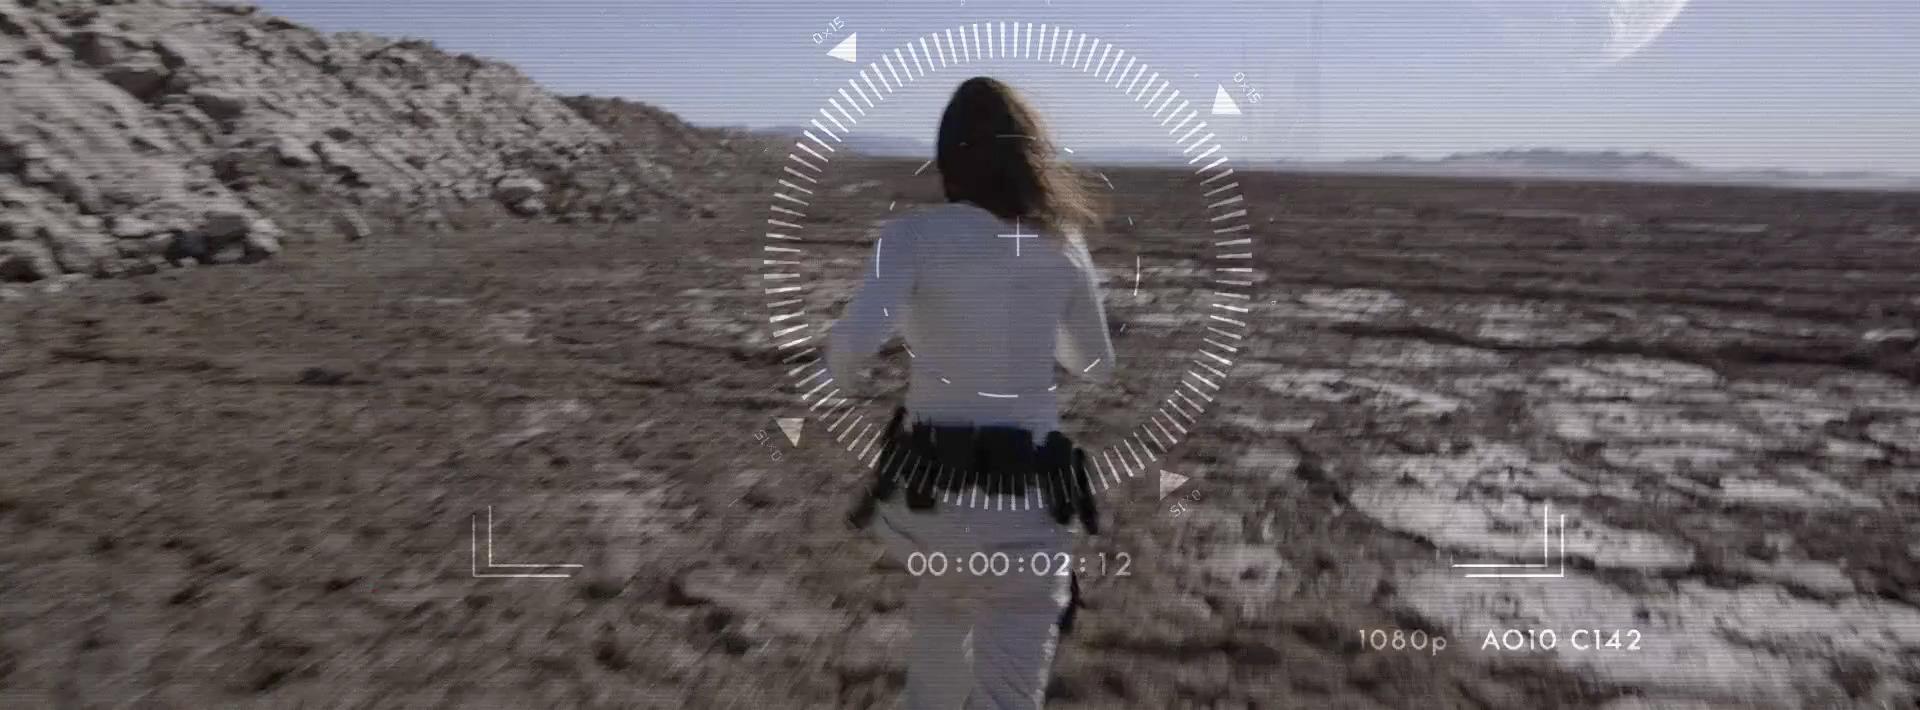 beautifully-shot-sci-fi-short-film-beyond-24.jpg